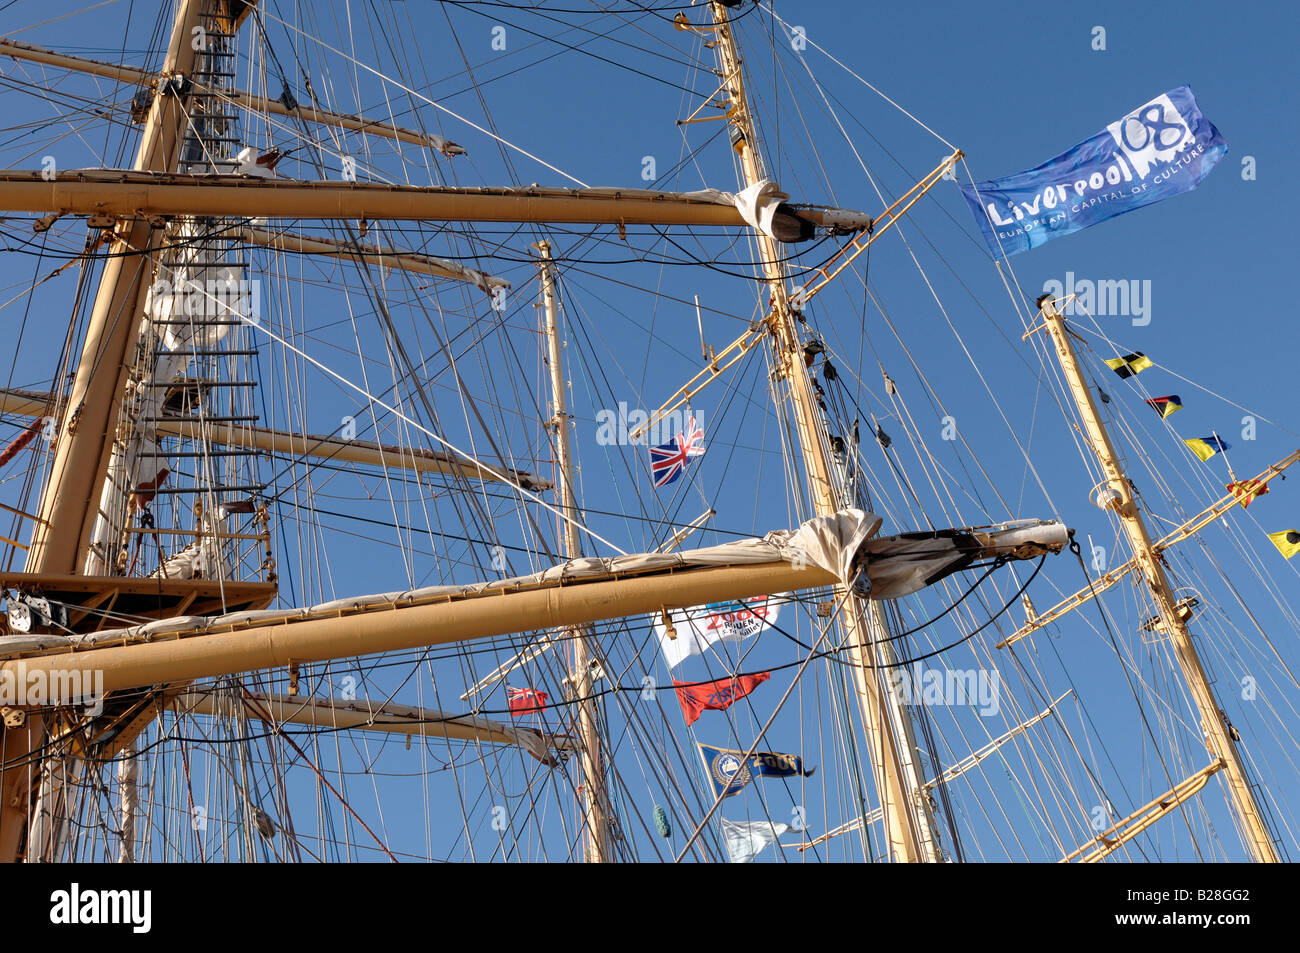 Tall ships Albert Dock Liverpool 2008 - Stock Image